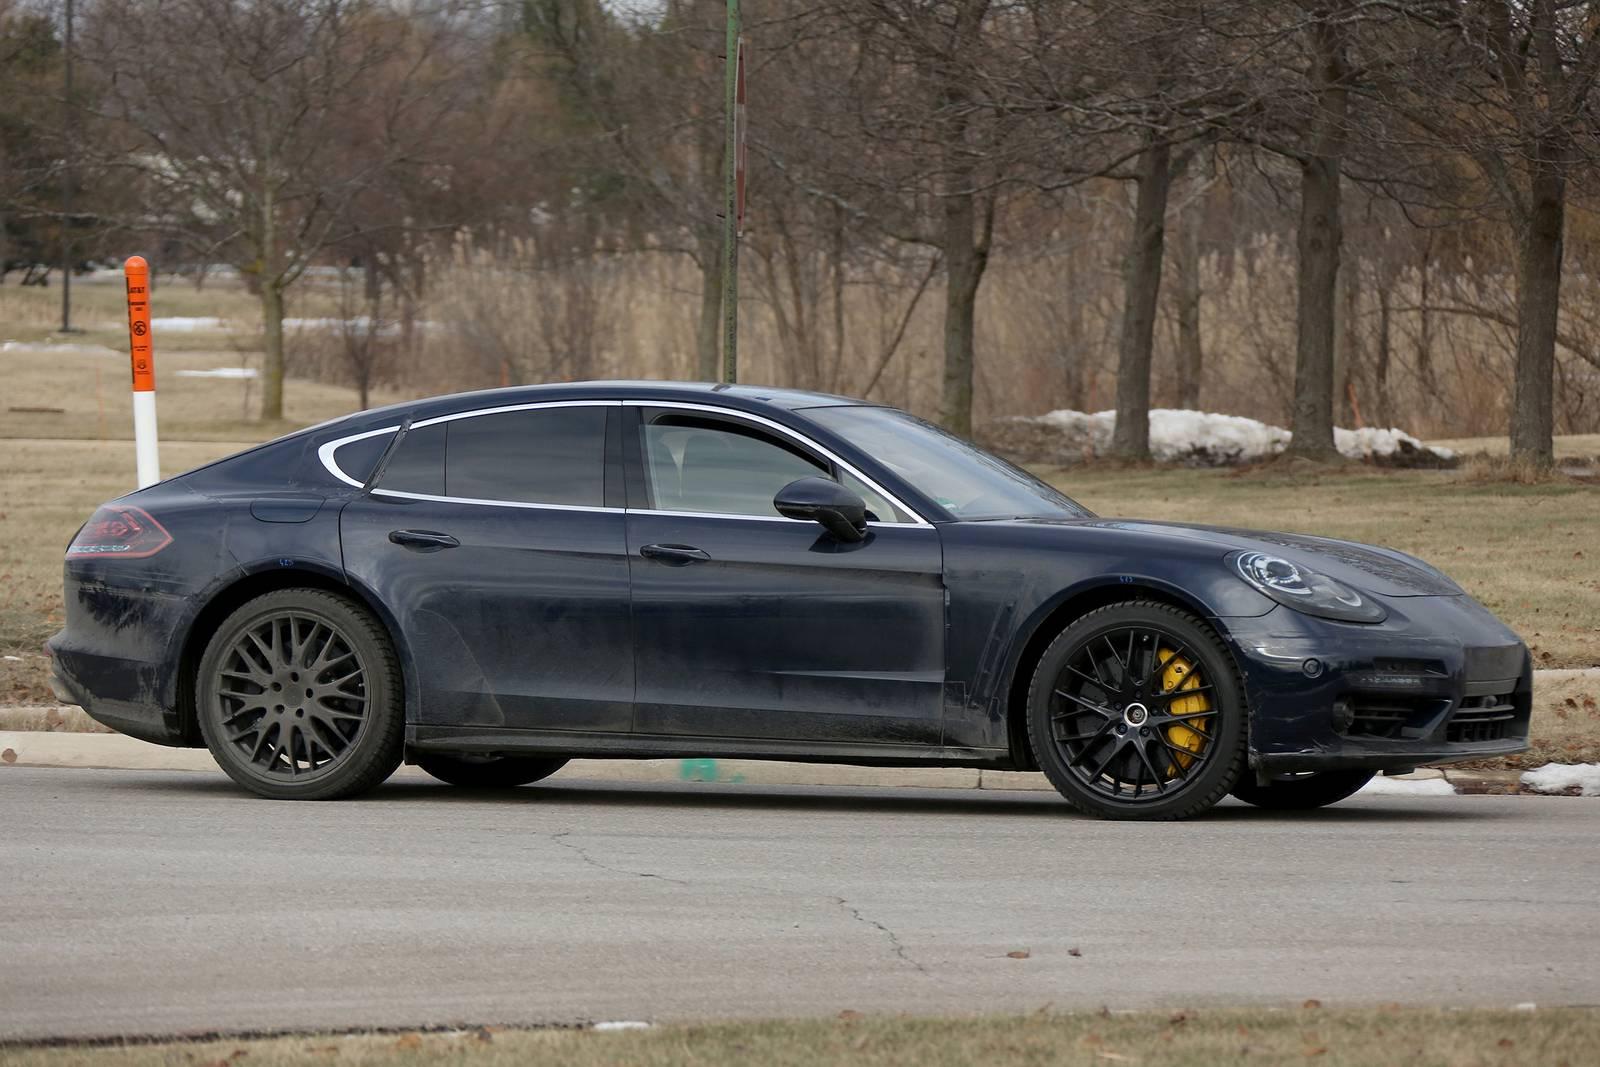 2018 porsche panamera shooting brake latest spy shots gtspirit - 2017 Porsche Panamera 971 Interior Spy Shots 1 Of 10 An Incredibly